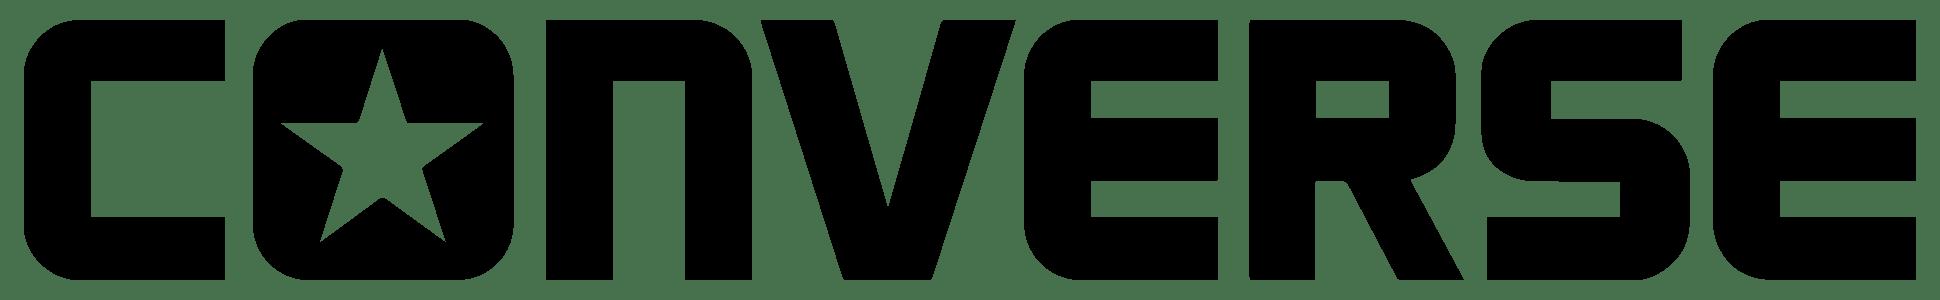 Converse_logo_black